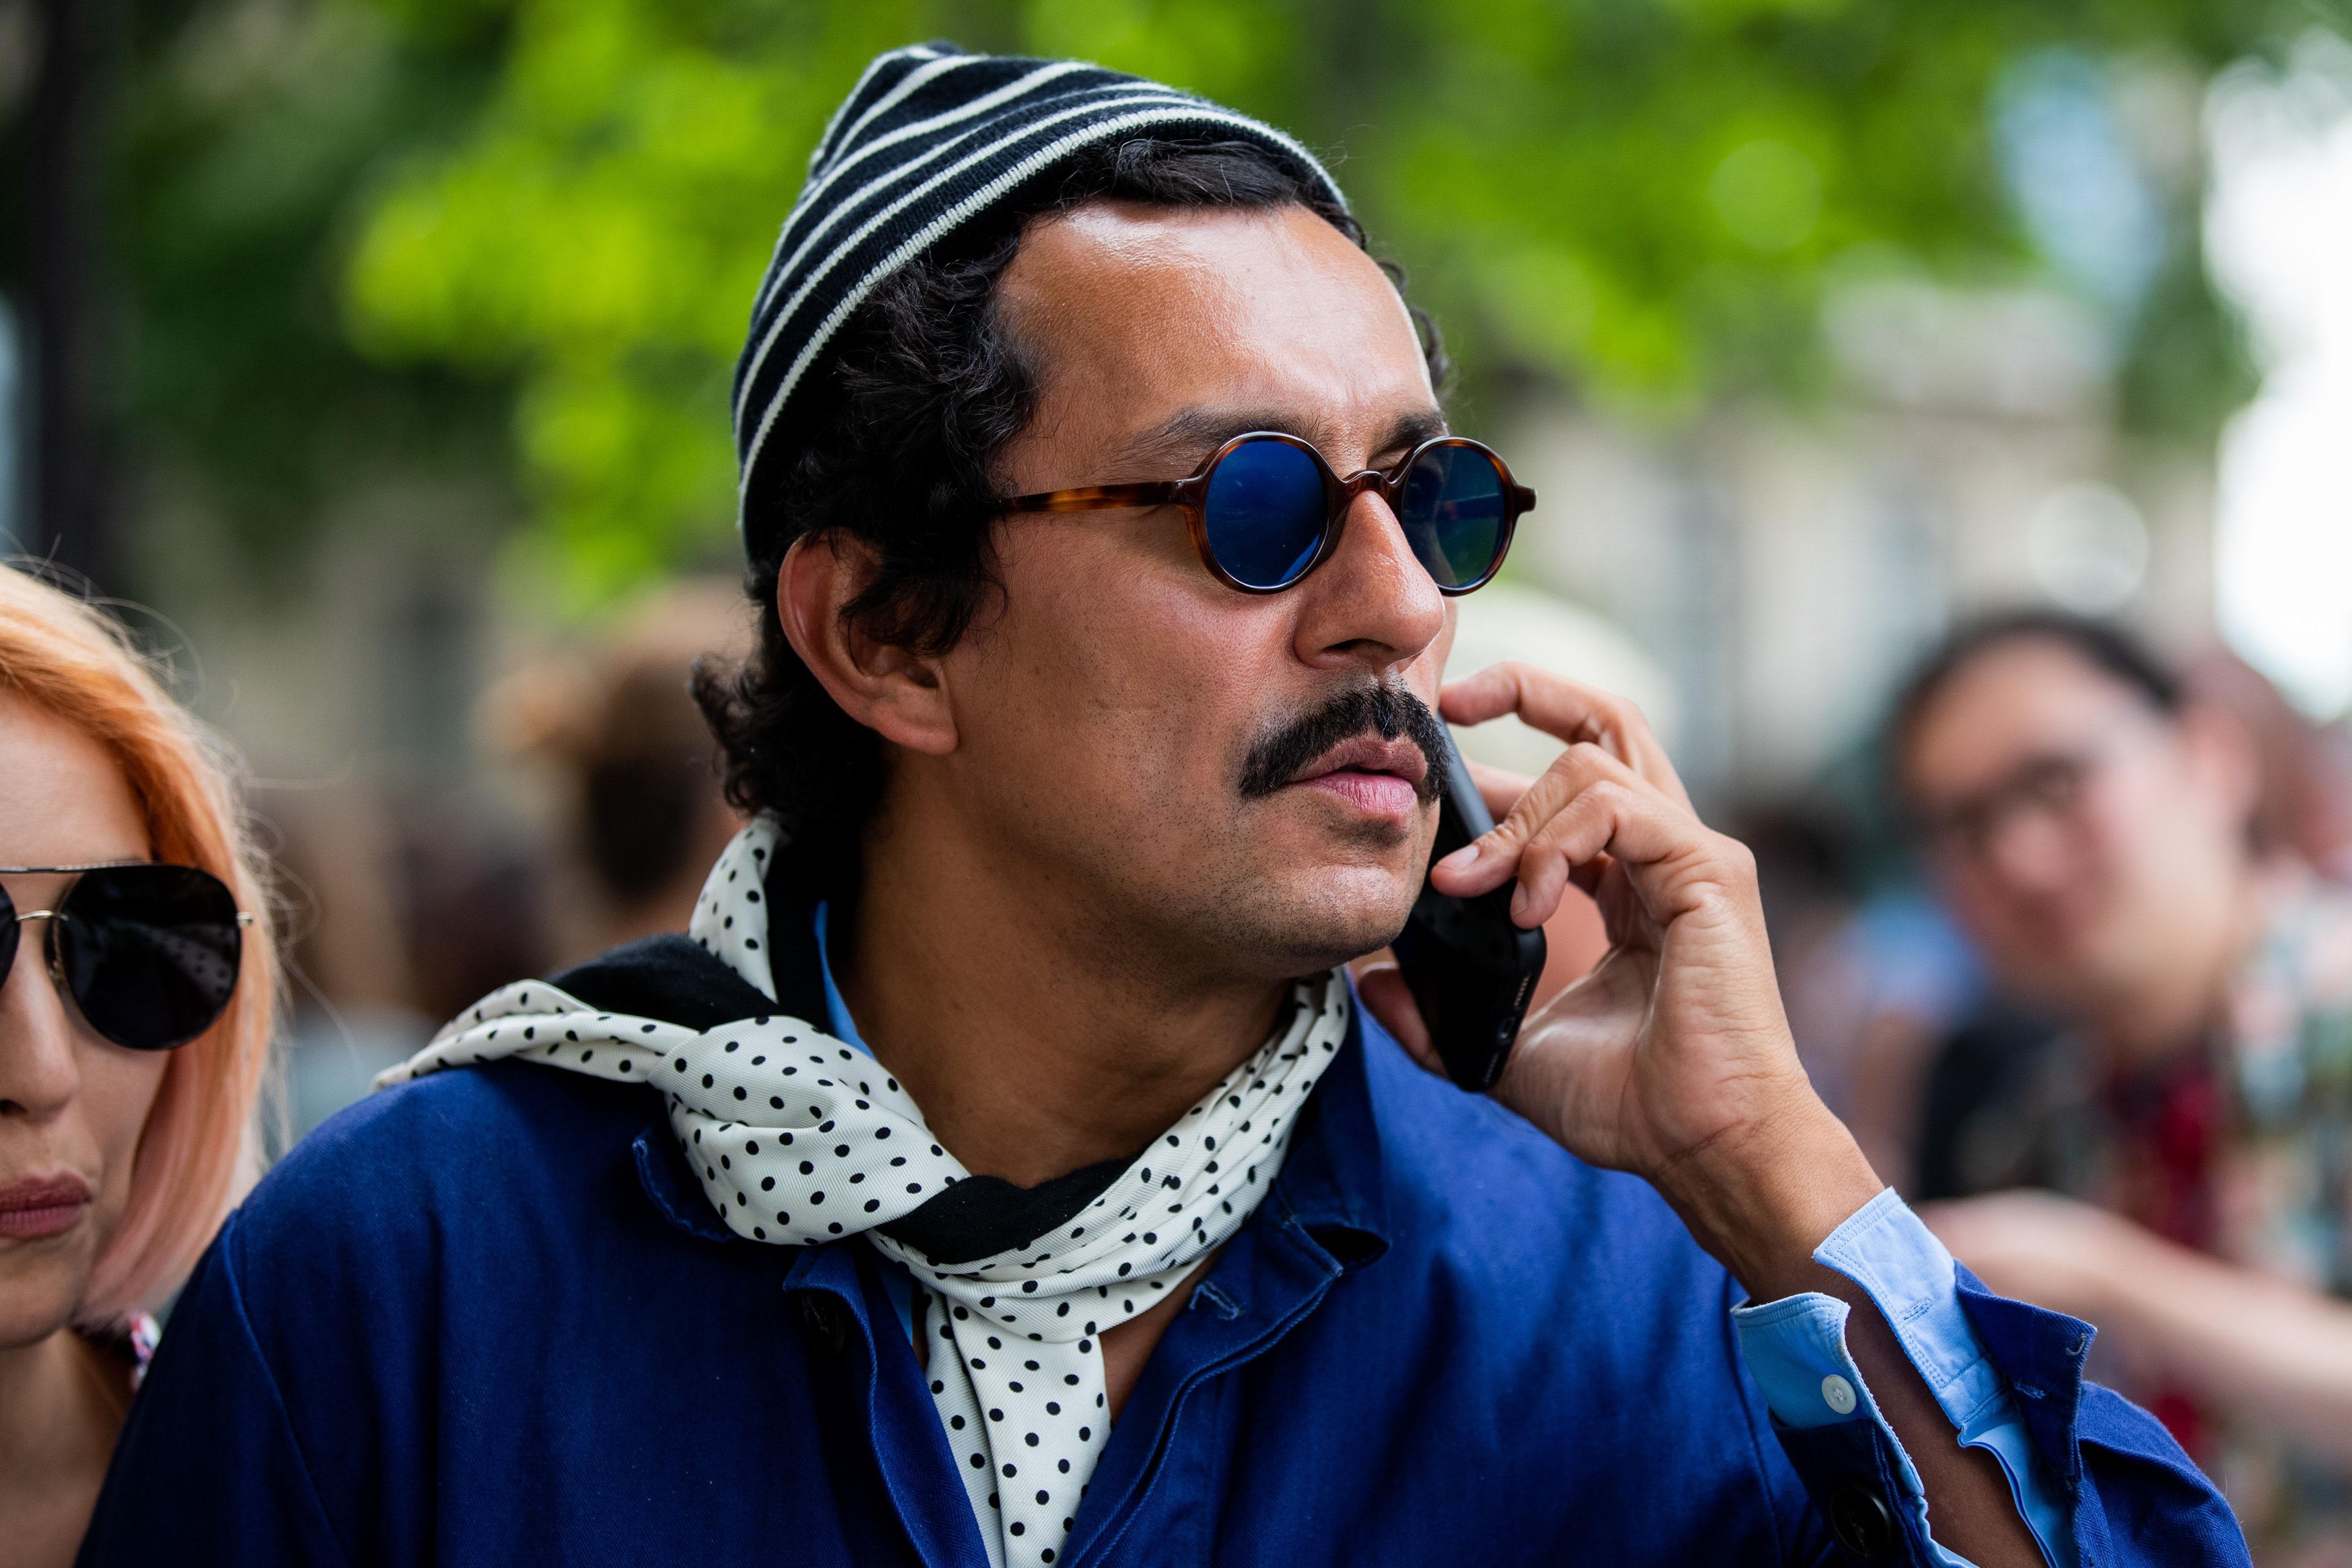 Haider Ackermann during Paris Fashion Week. Getty Images.